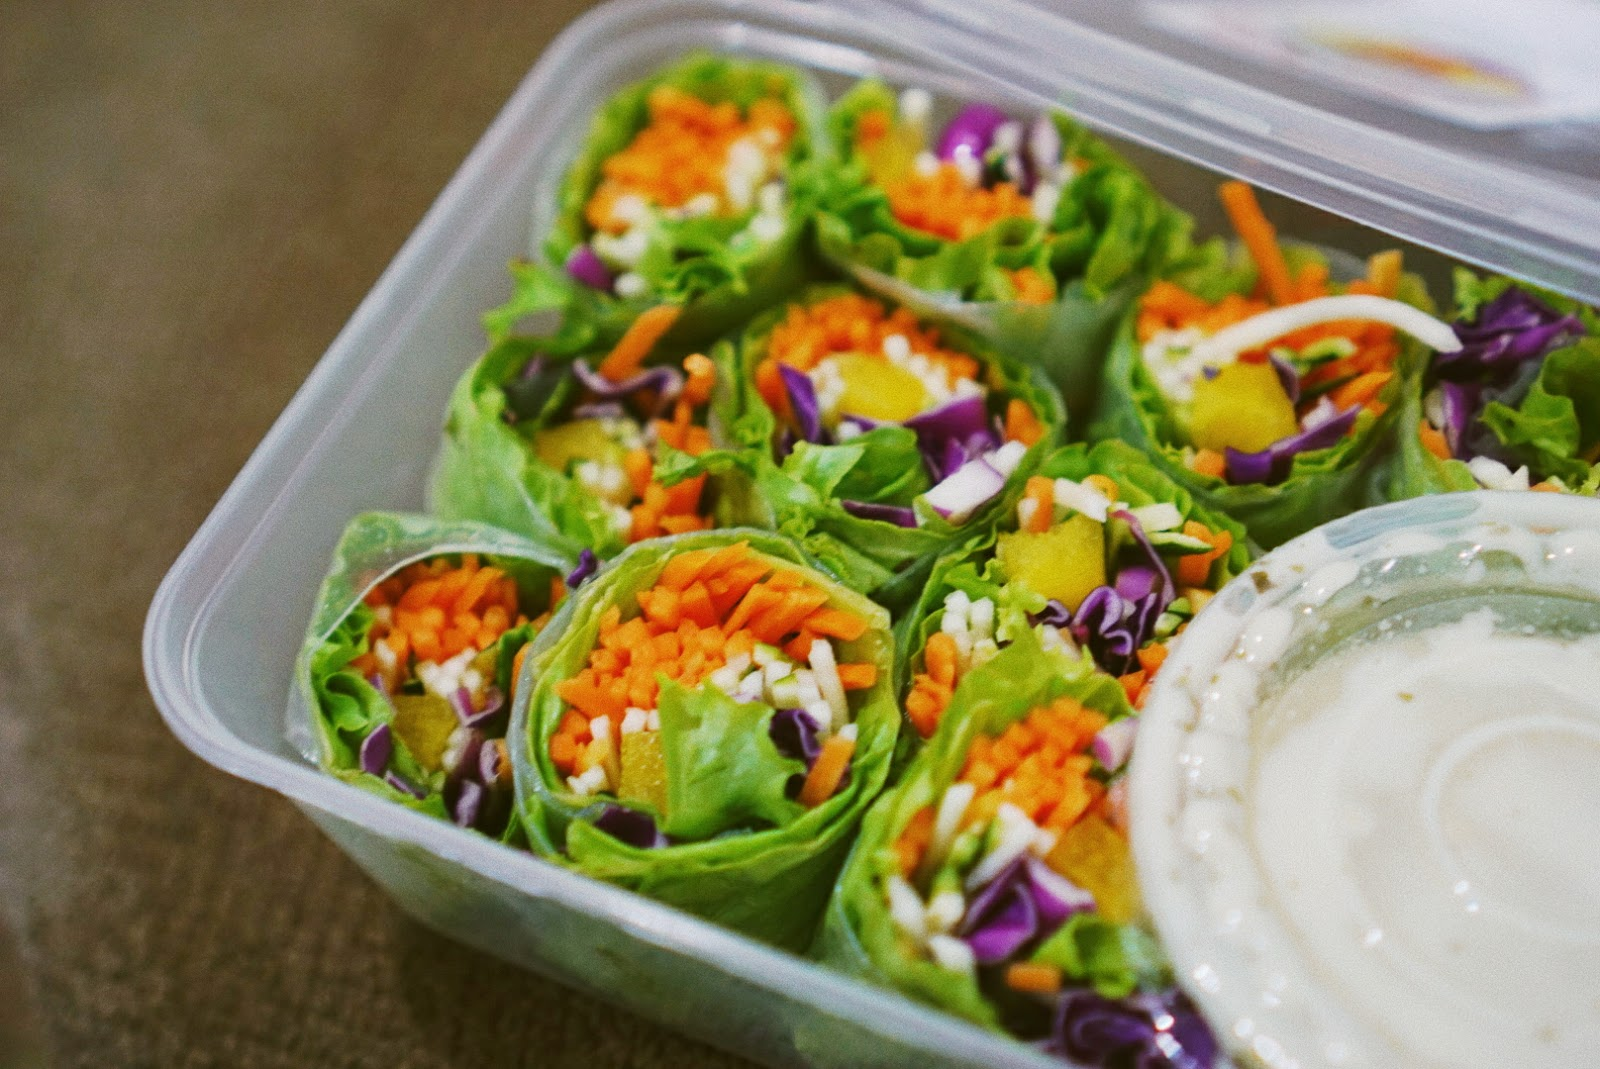 Serasa Salad Bar = Sekotak Pelangi Bernutrisi - Salad Roll